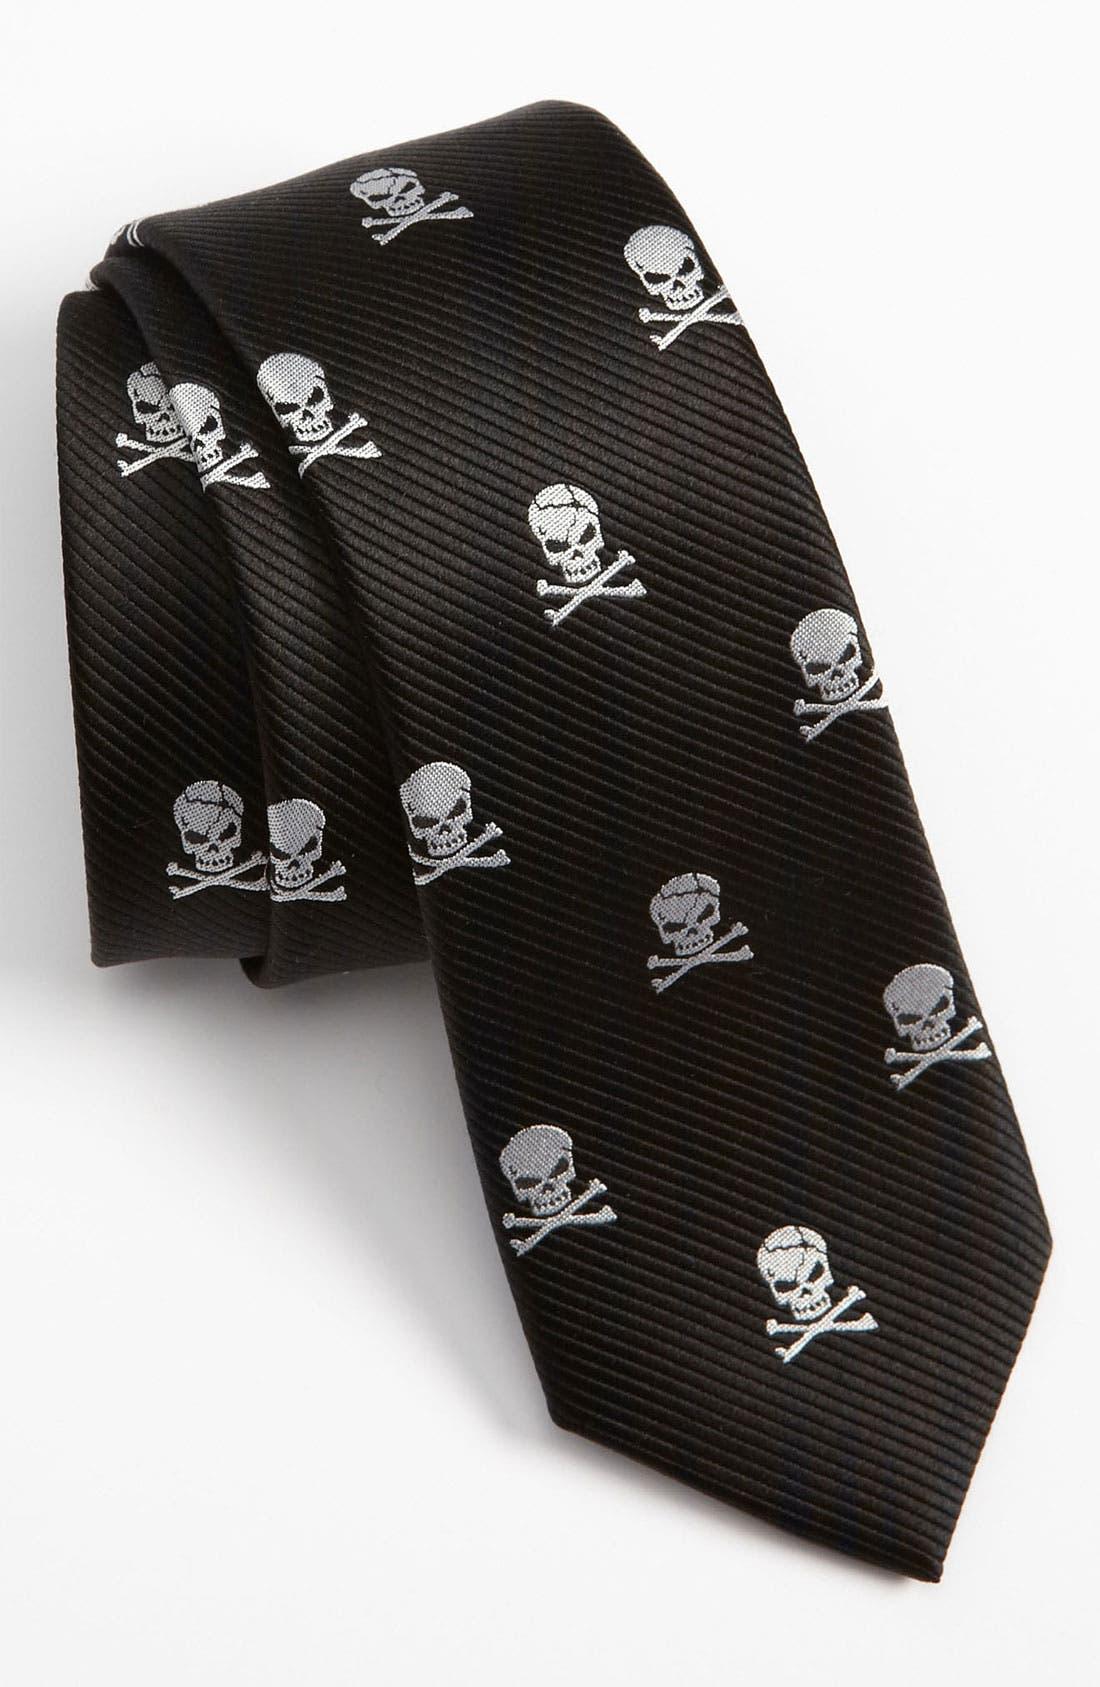 Main Image - The Tie Bar Silk Skull and Crossbones Tie (Online Only)